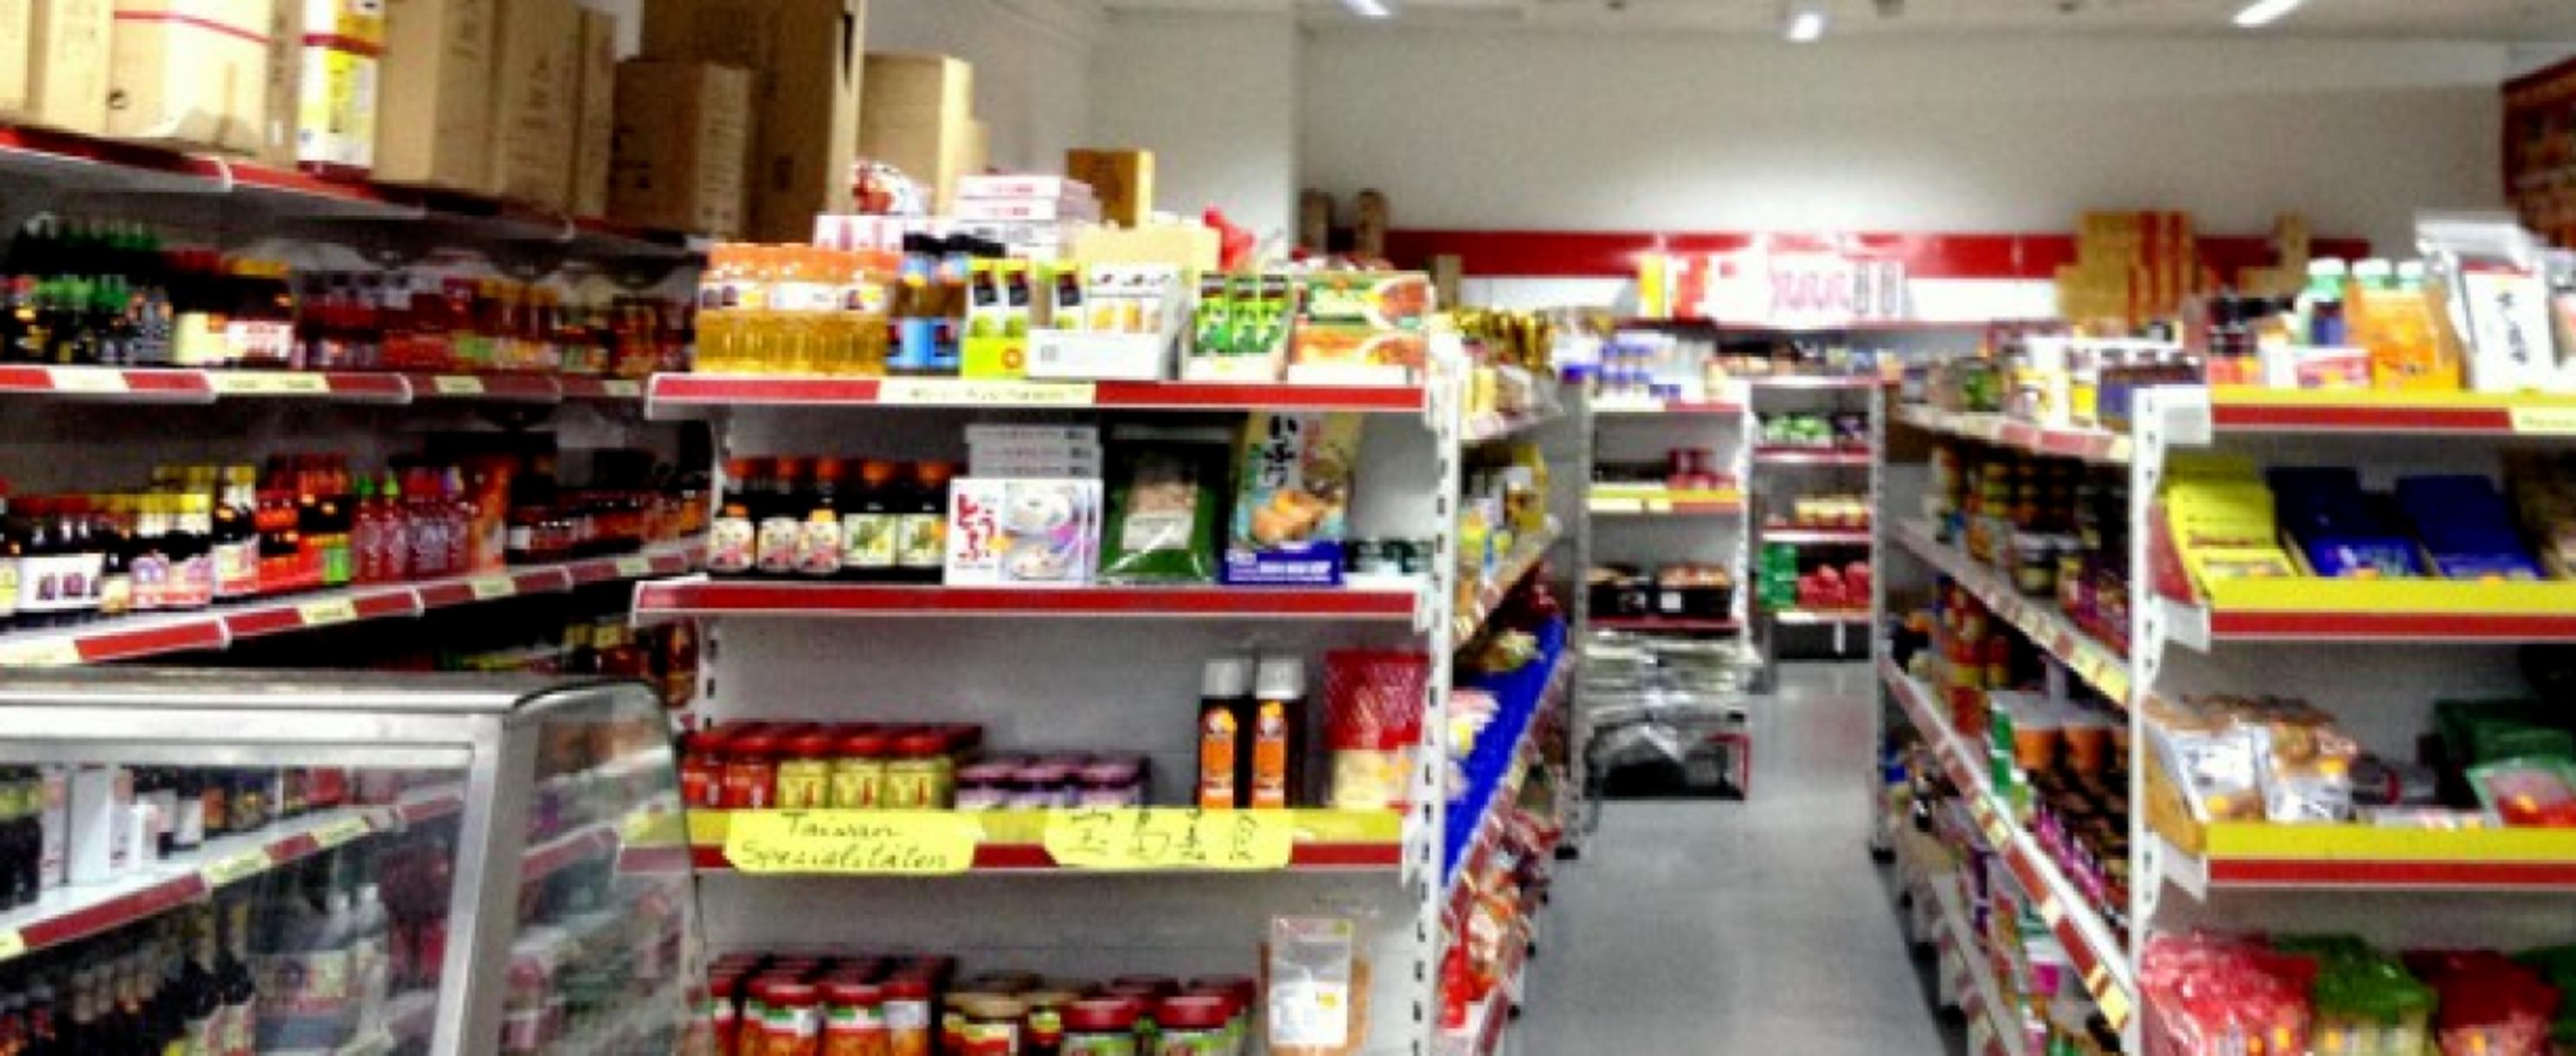 asia markt bonn